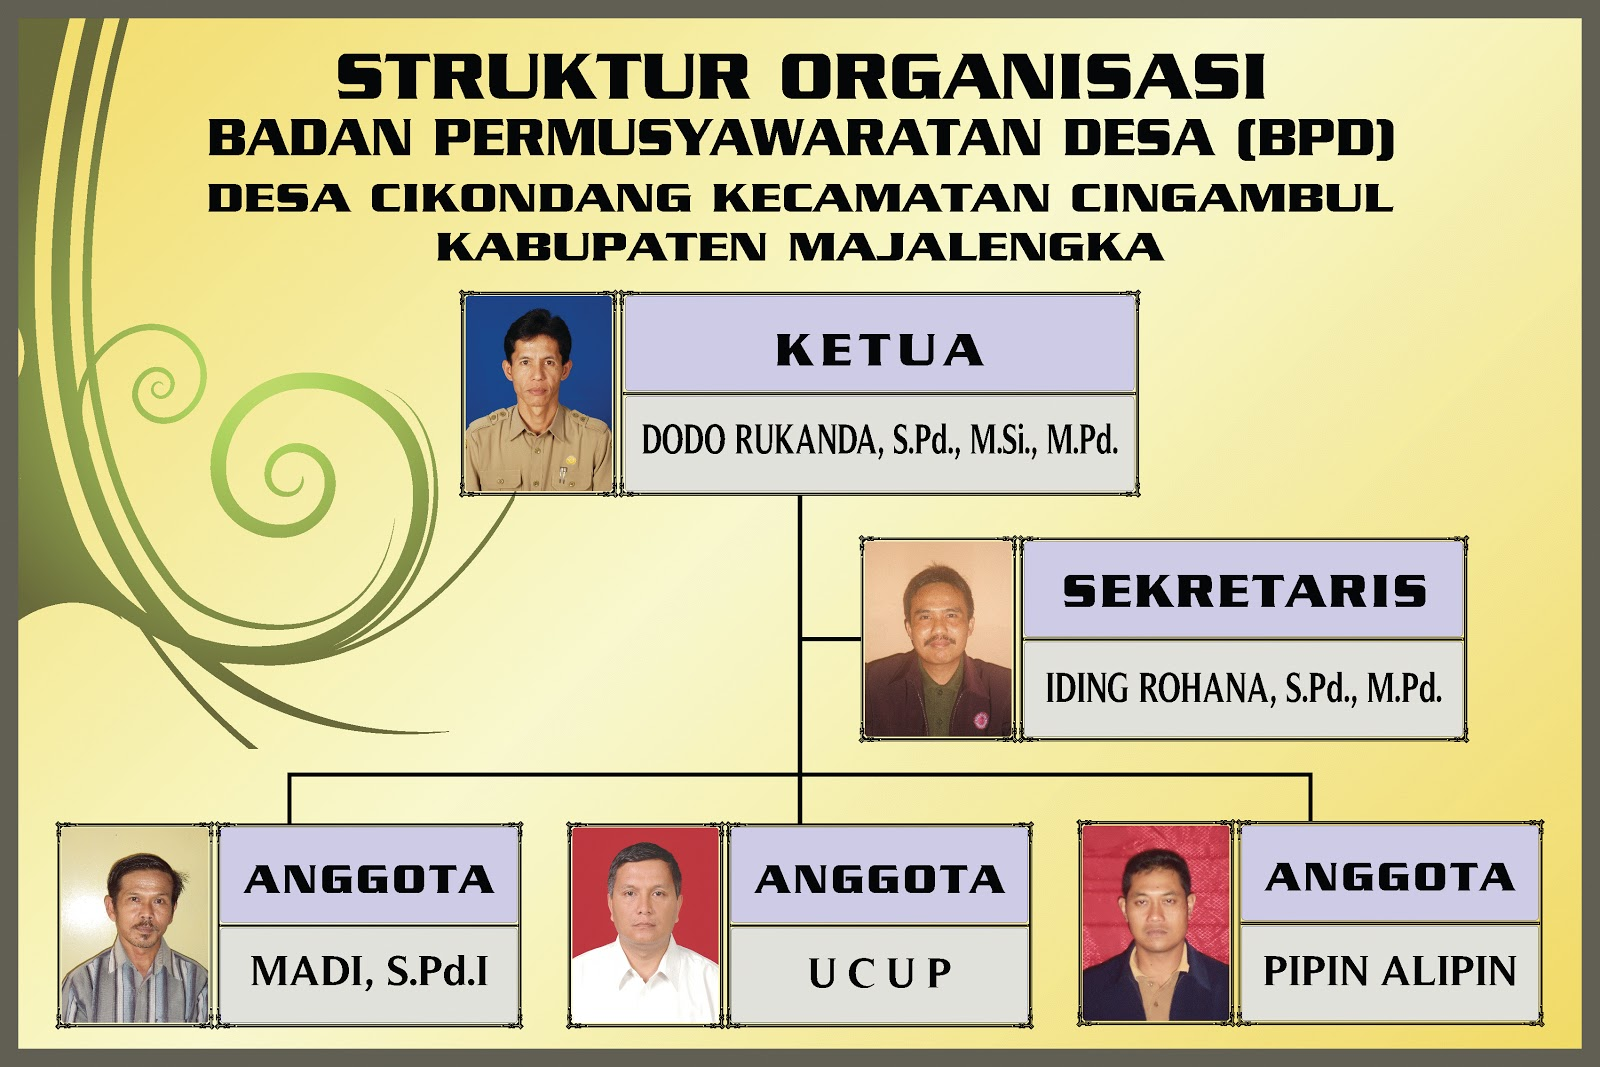 Desa cikondang 321023 struktur organisasi bpd